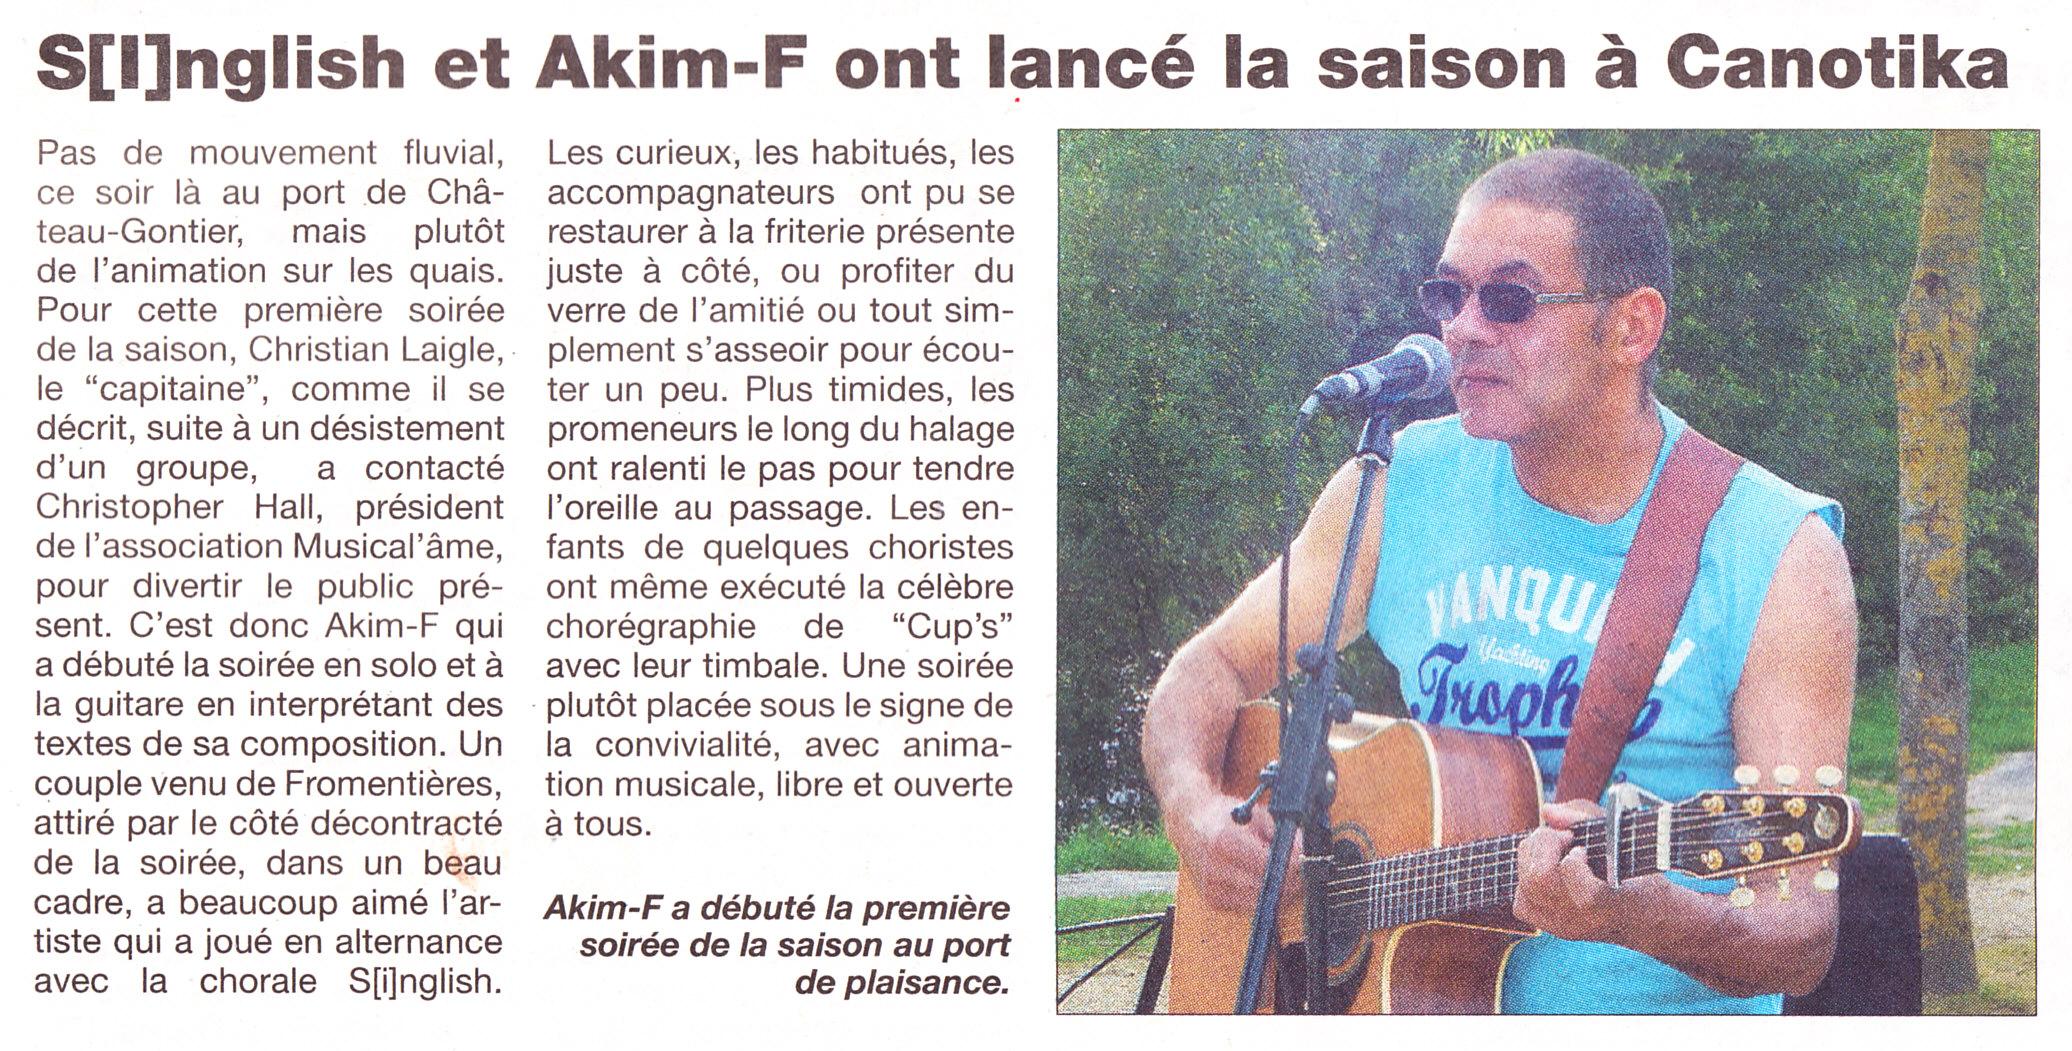 s[i]nglish_Akim-F_Haut-Anjou_2014-06-13_No.3645